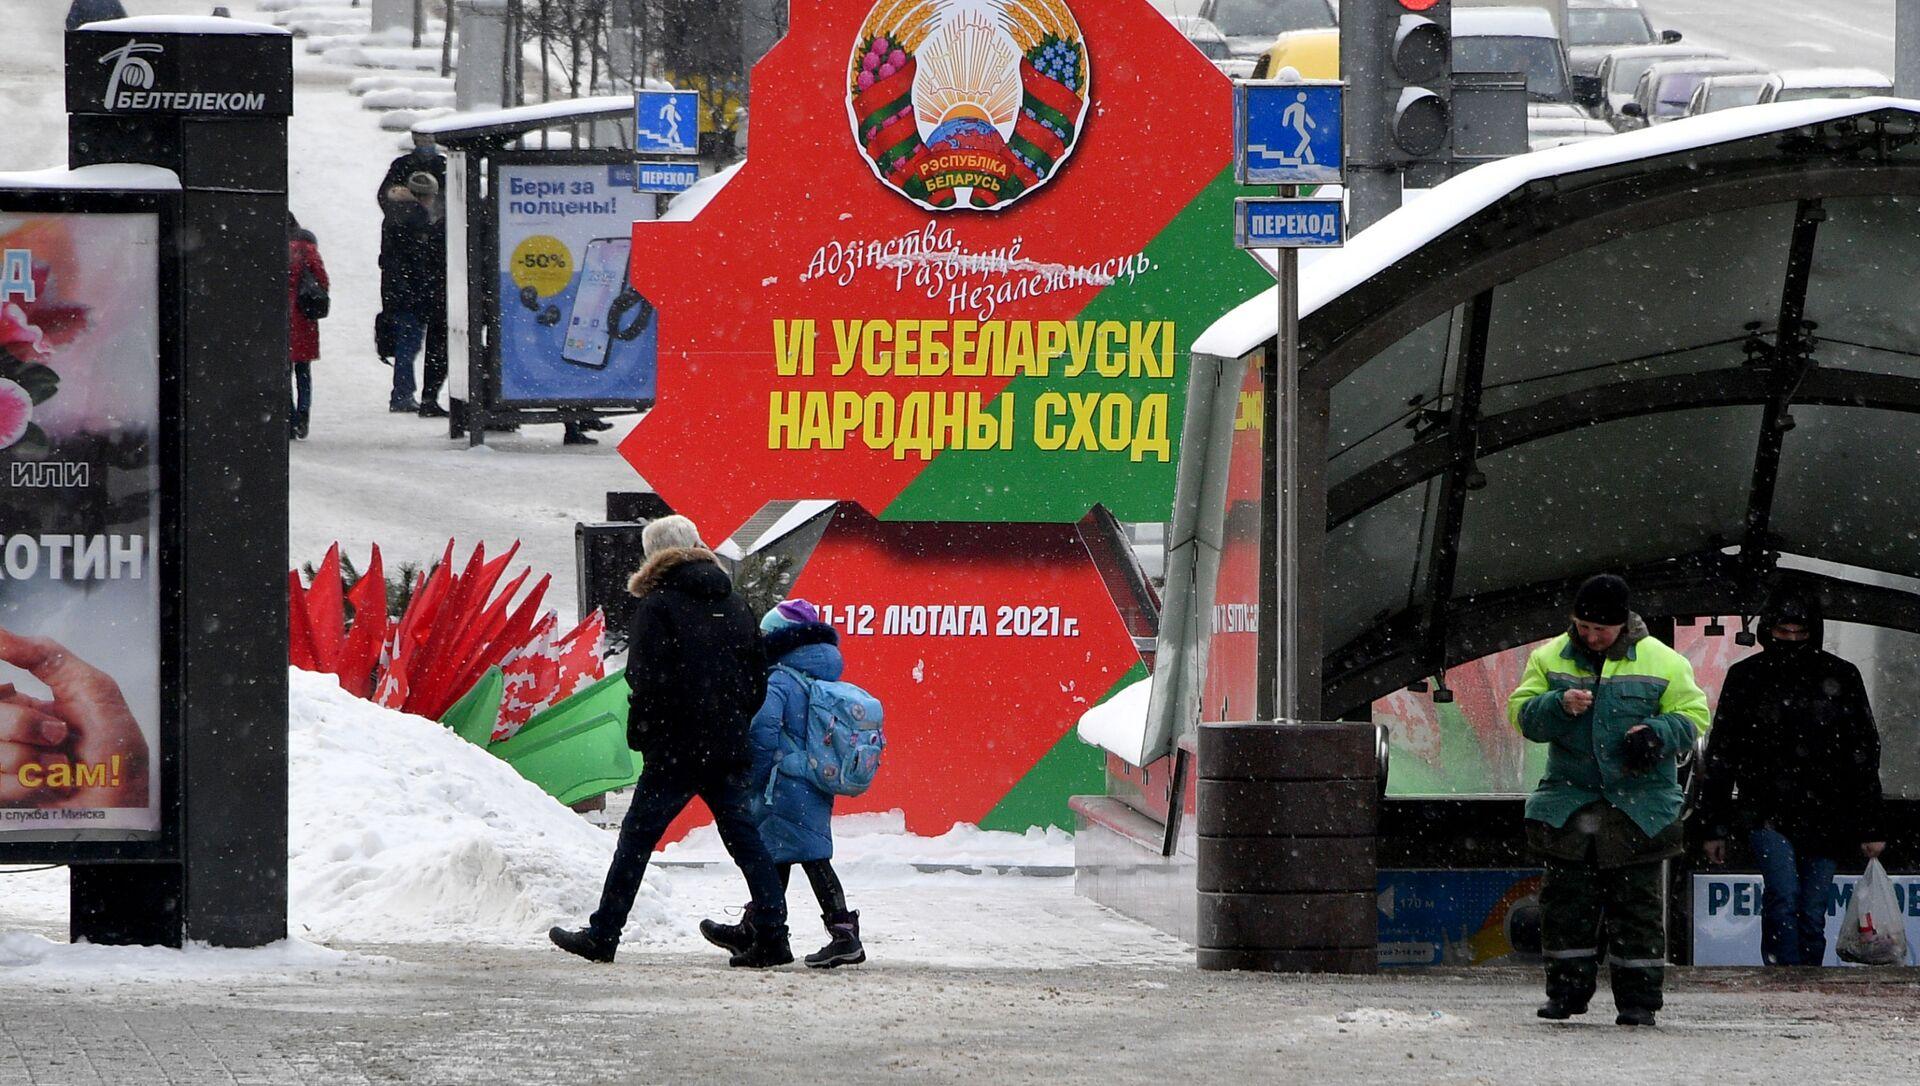 Усебеларускі народны сход - Sputnik Беларусь, 1920, 15.02.2021